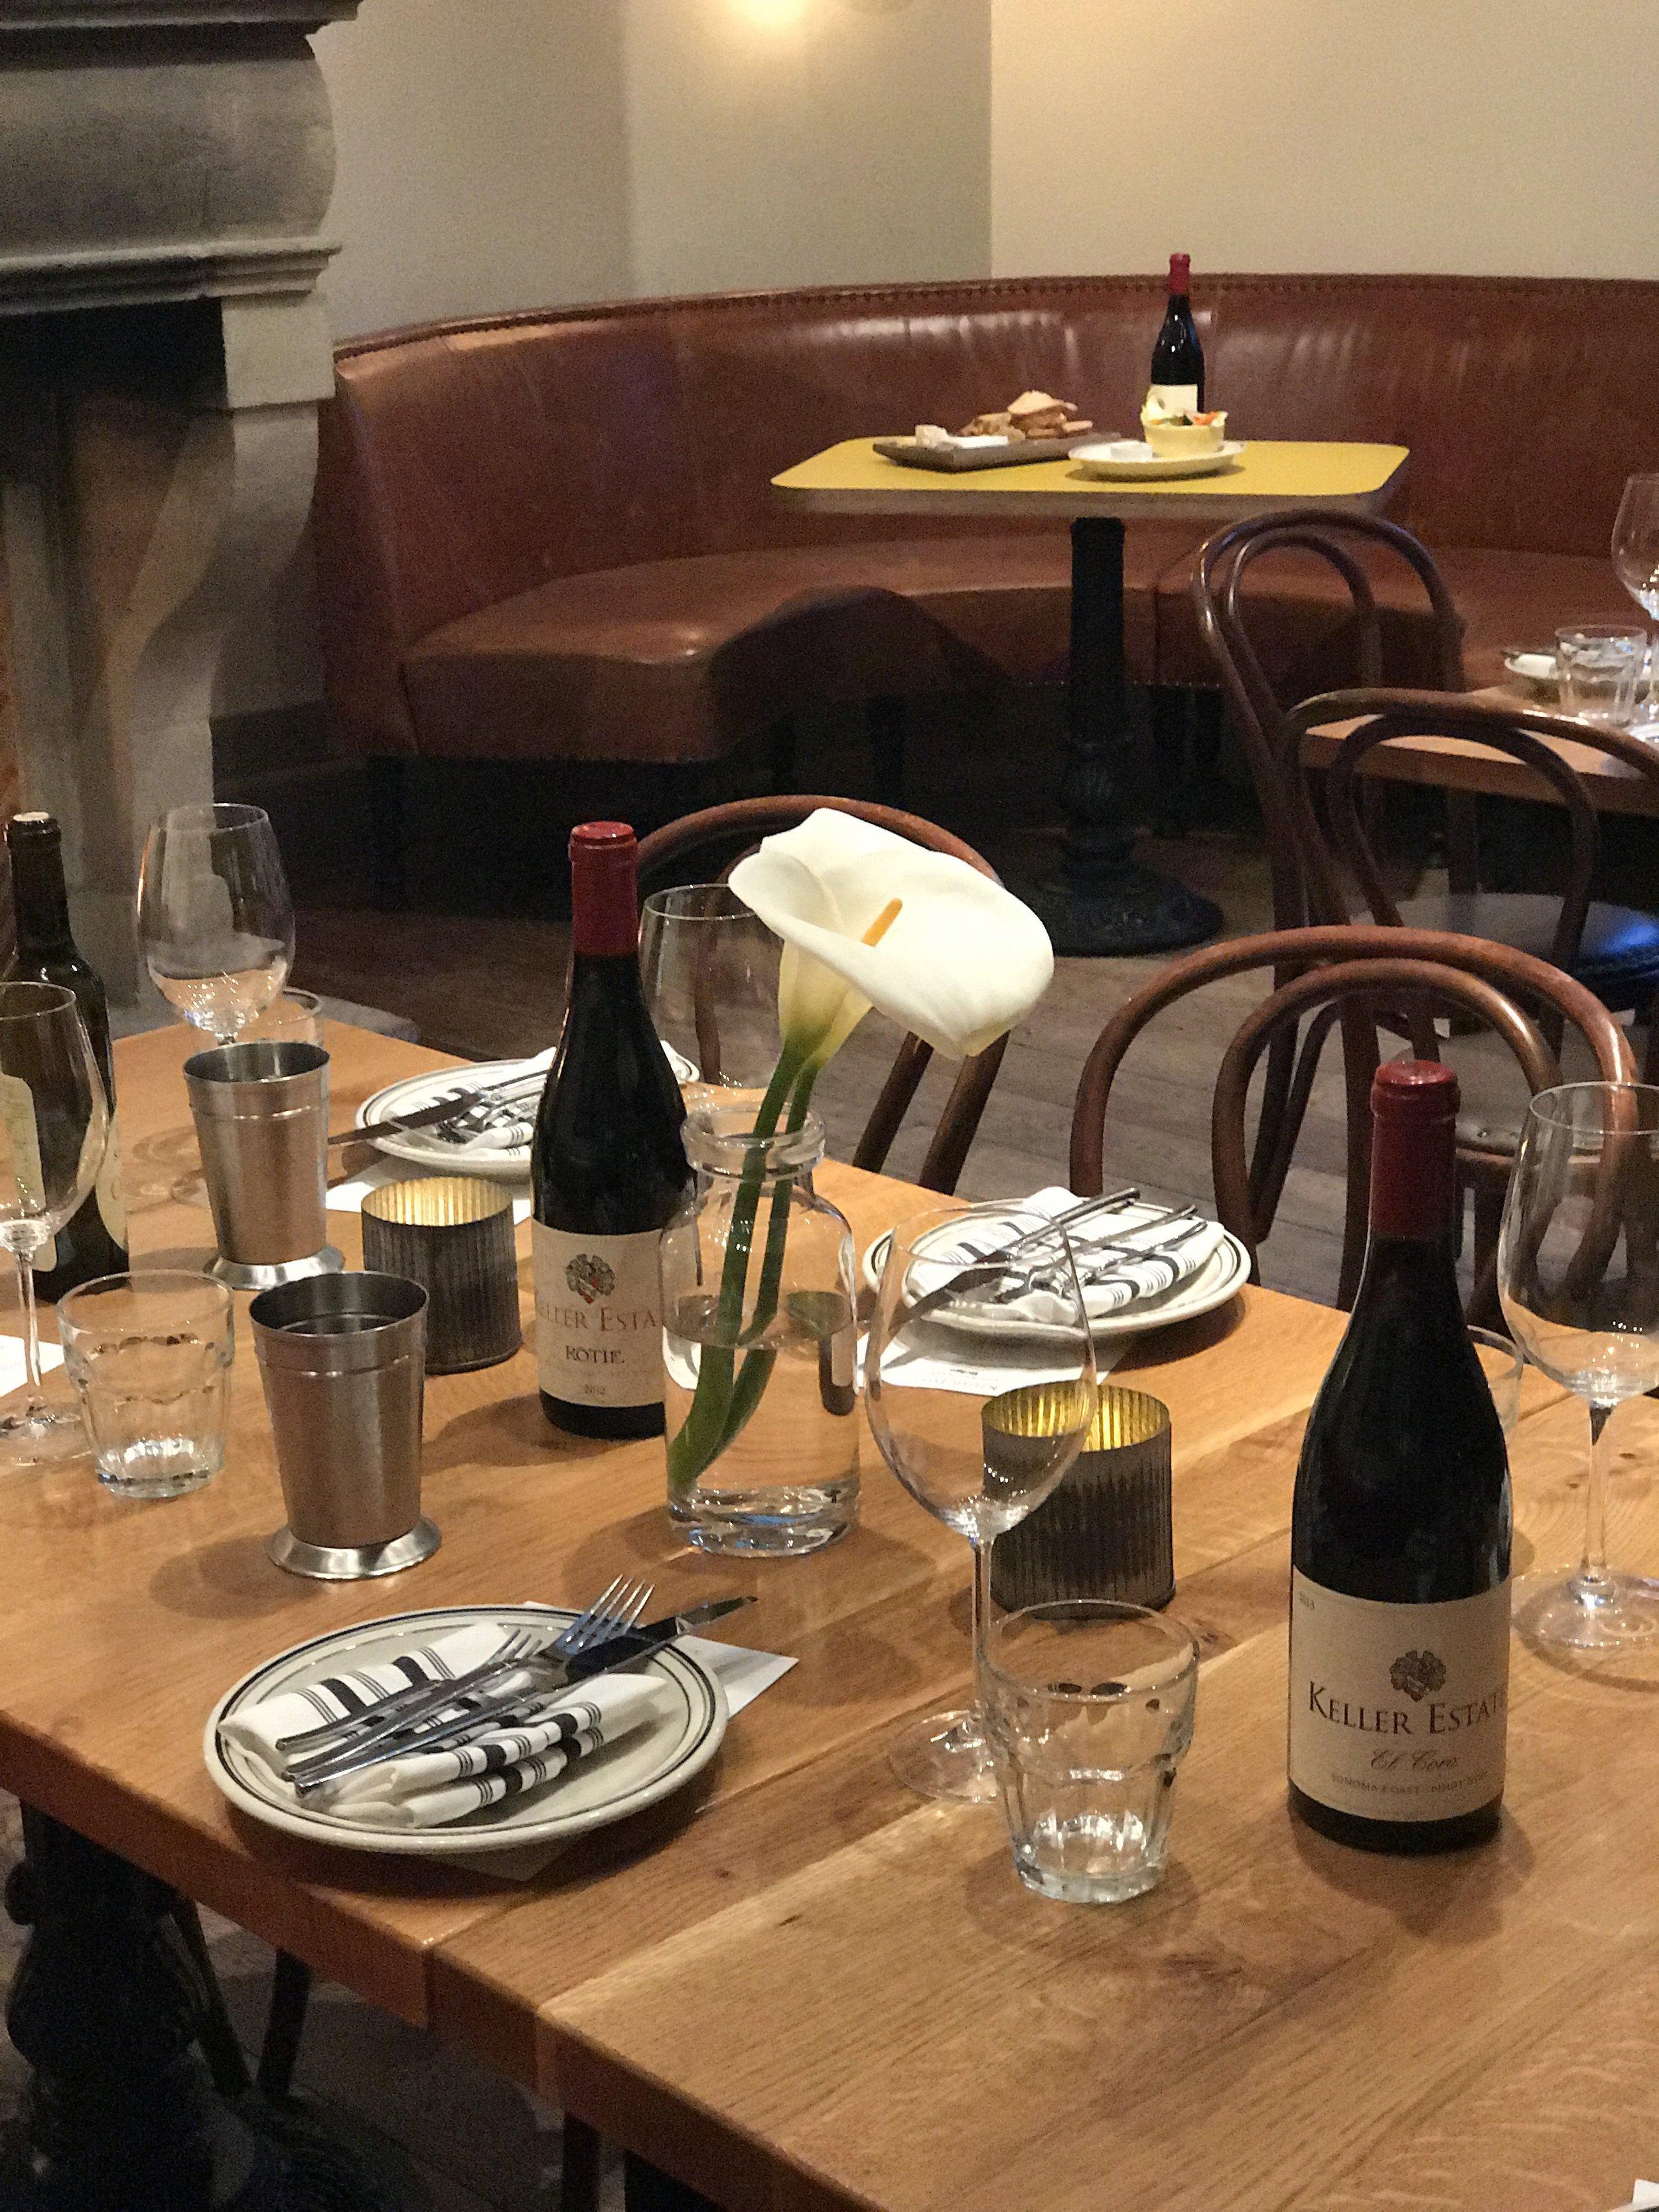 Winemaker dinner with Keller Estates at Belga, San Francisco